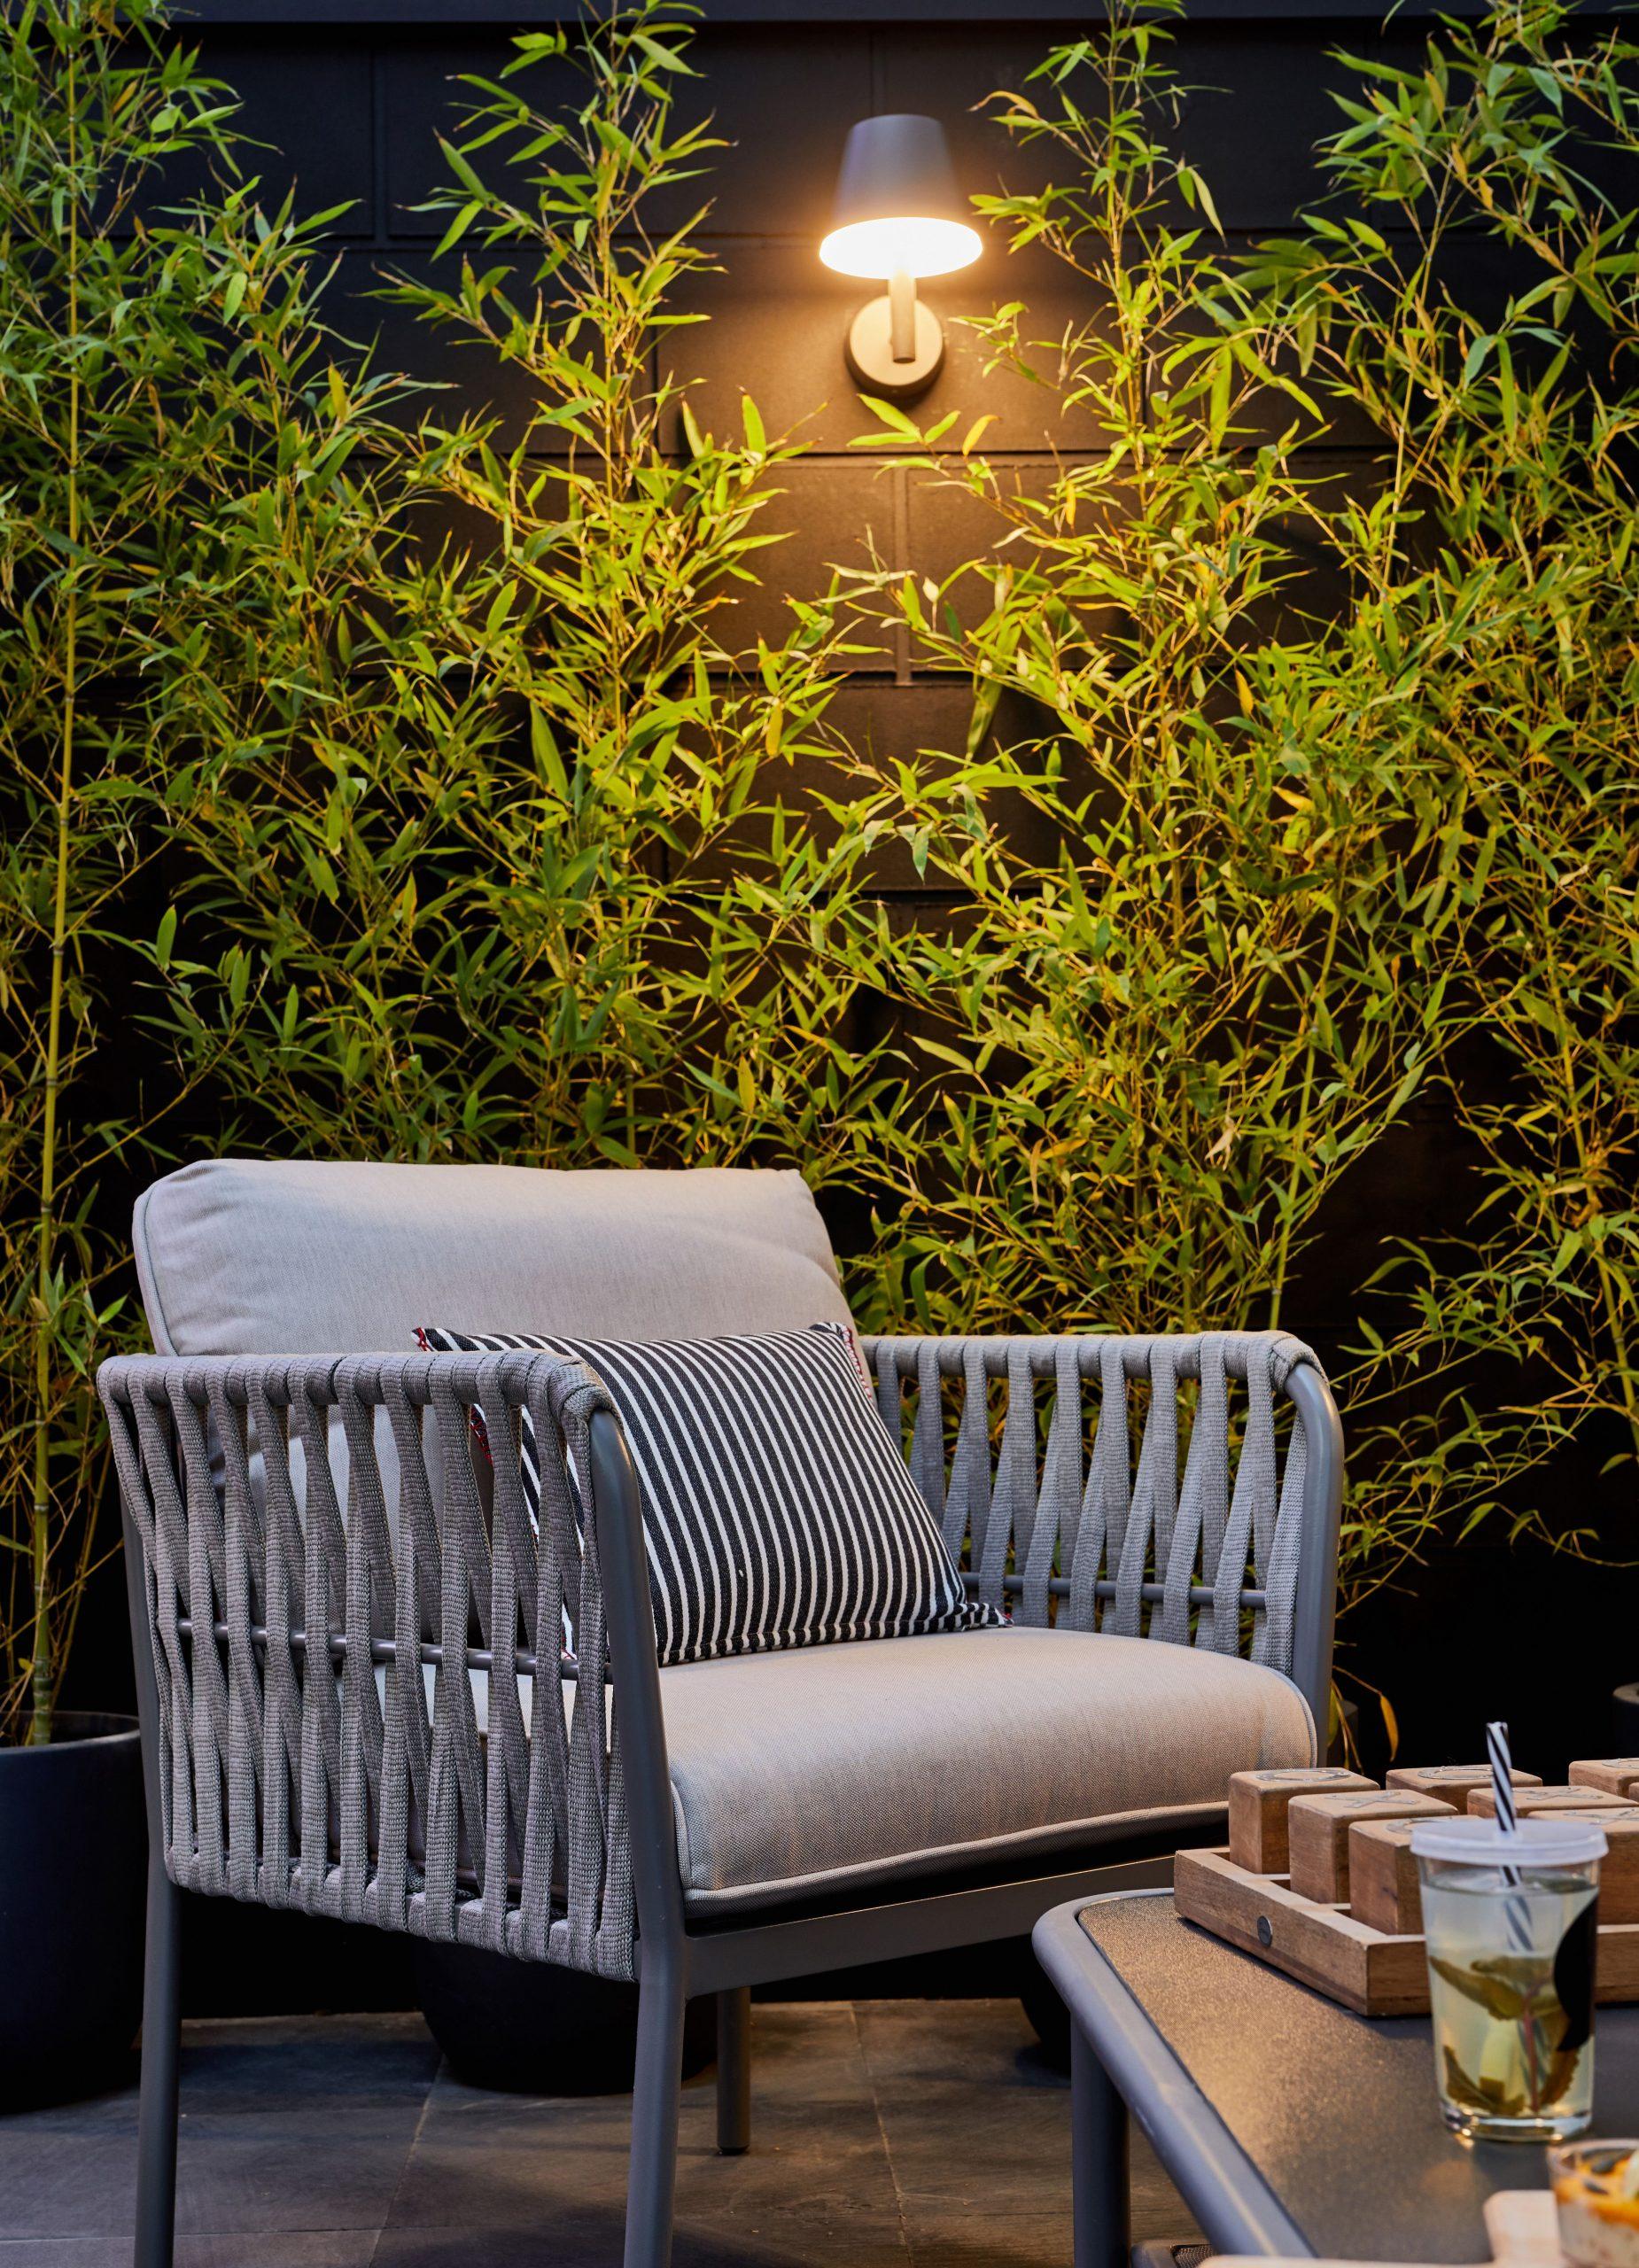 Épinglé Sur Lovelife pour Destockage Salon De Jardin